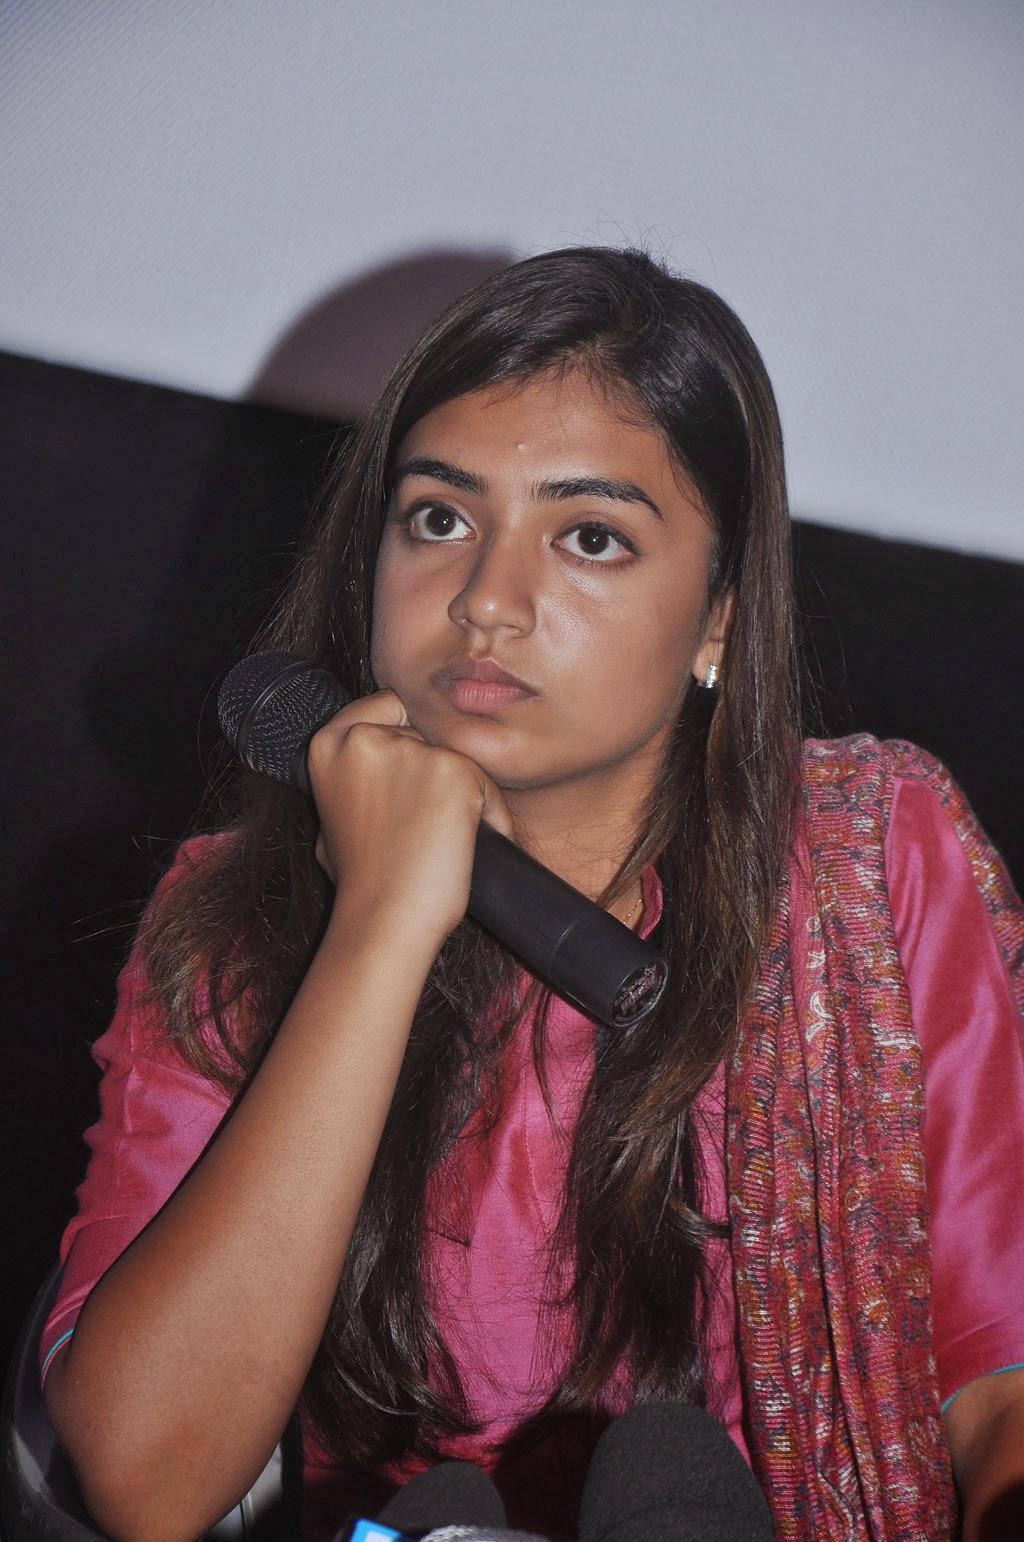 Nazriya Nazim Cute Photos: Nazriya Nazim Latest Photos At The Press Meet After